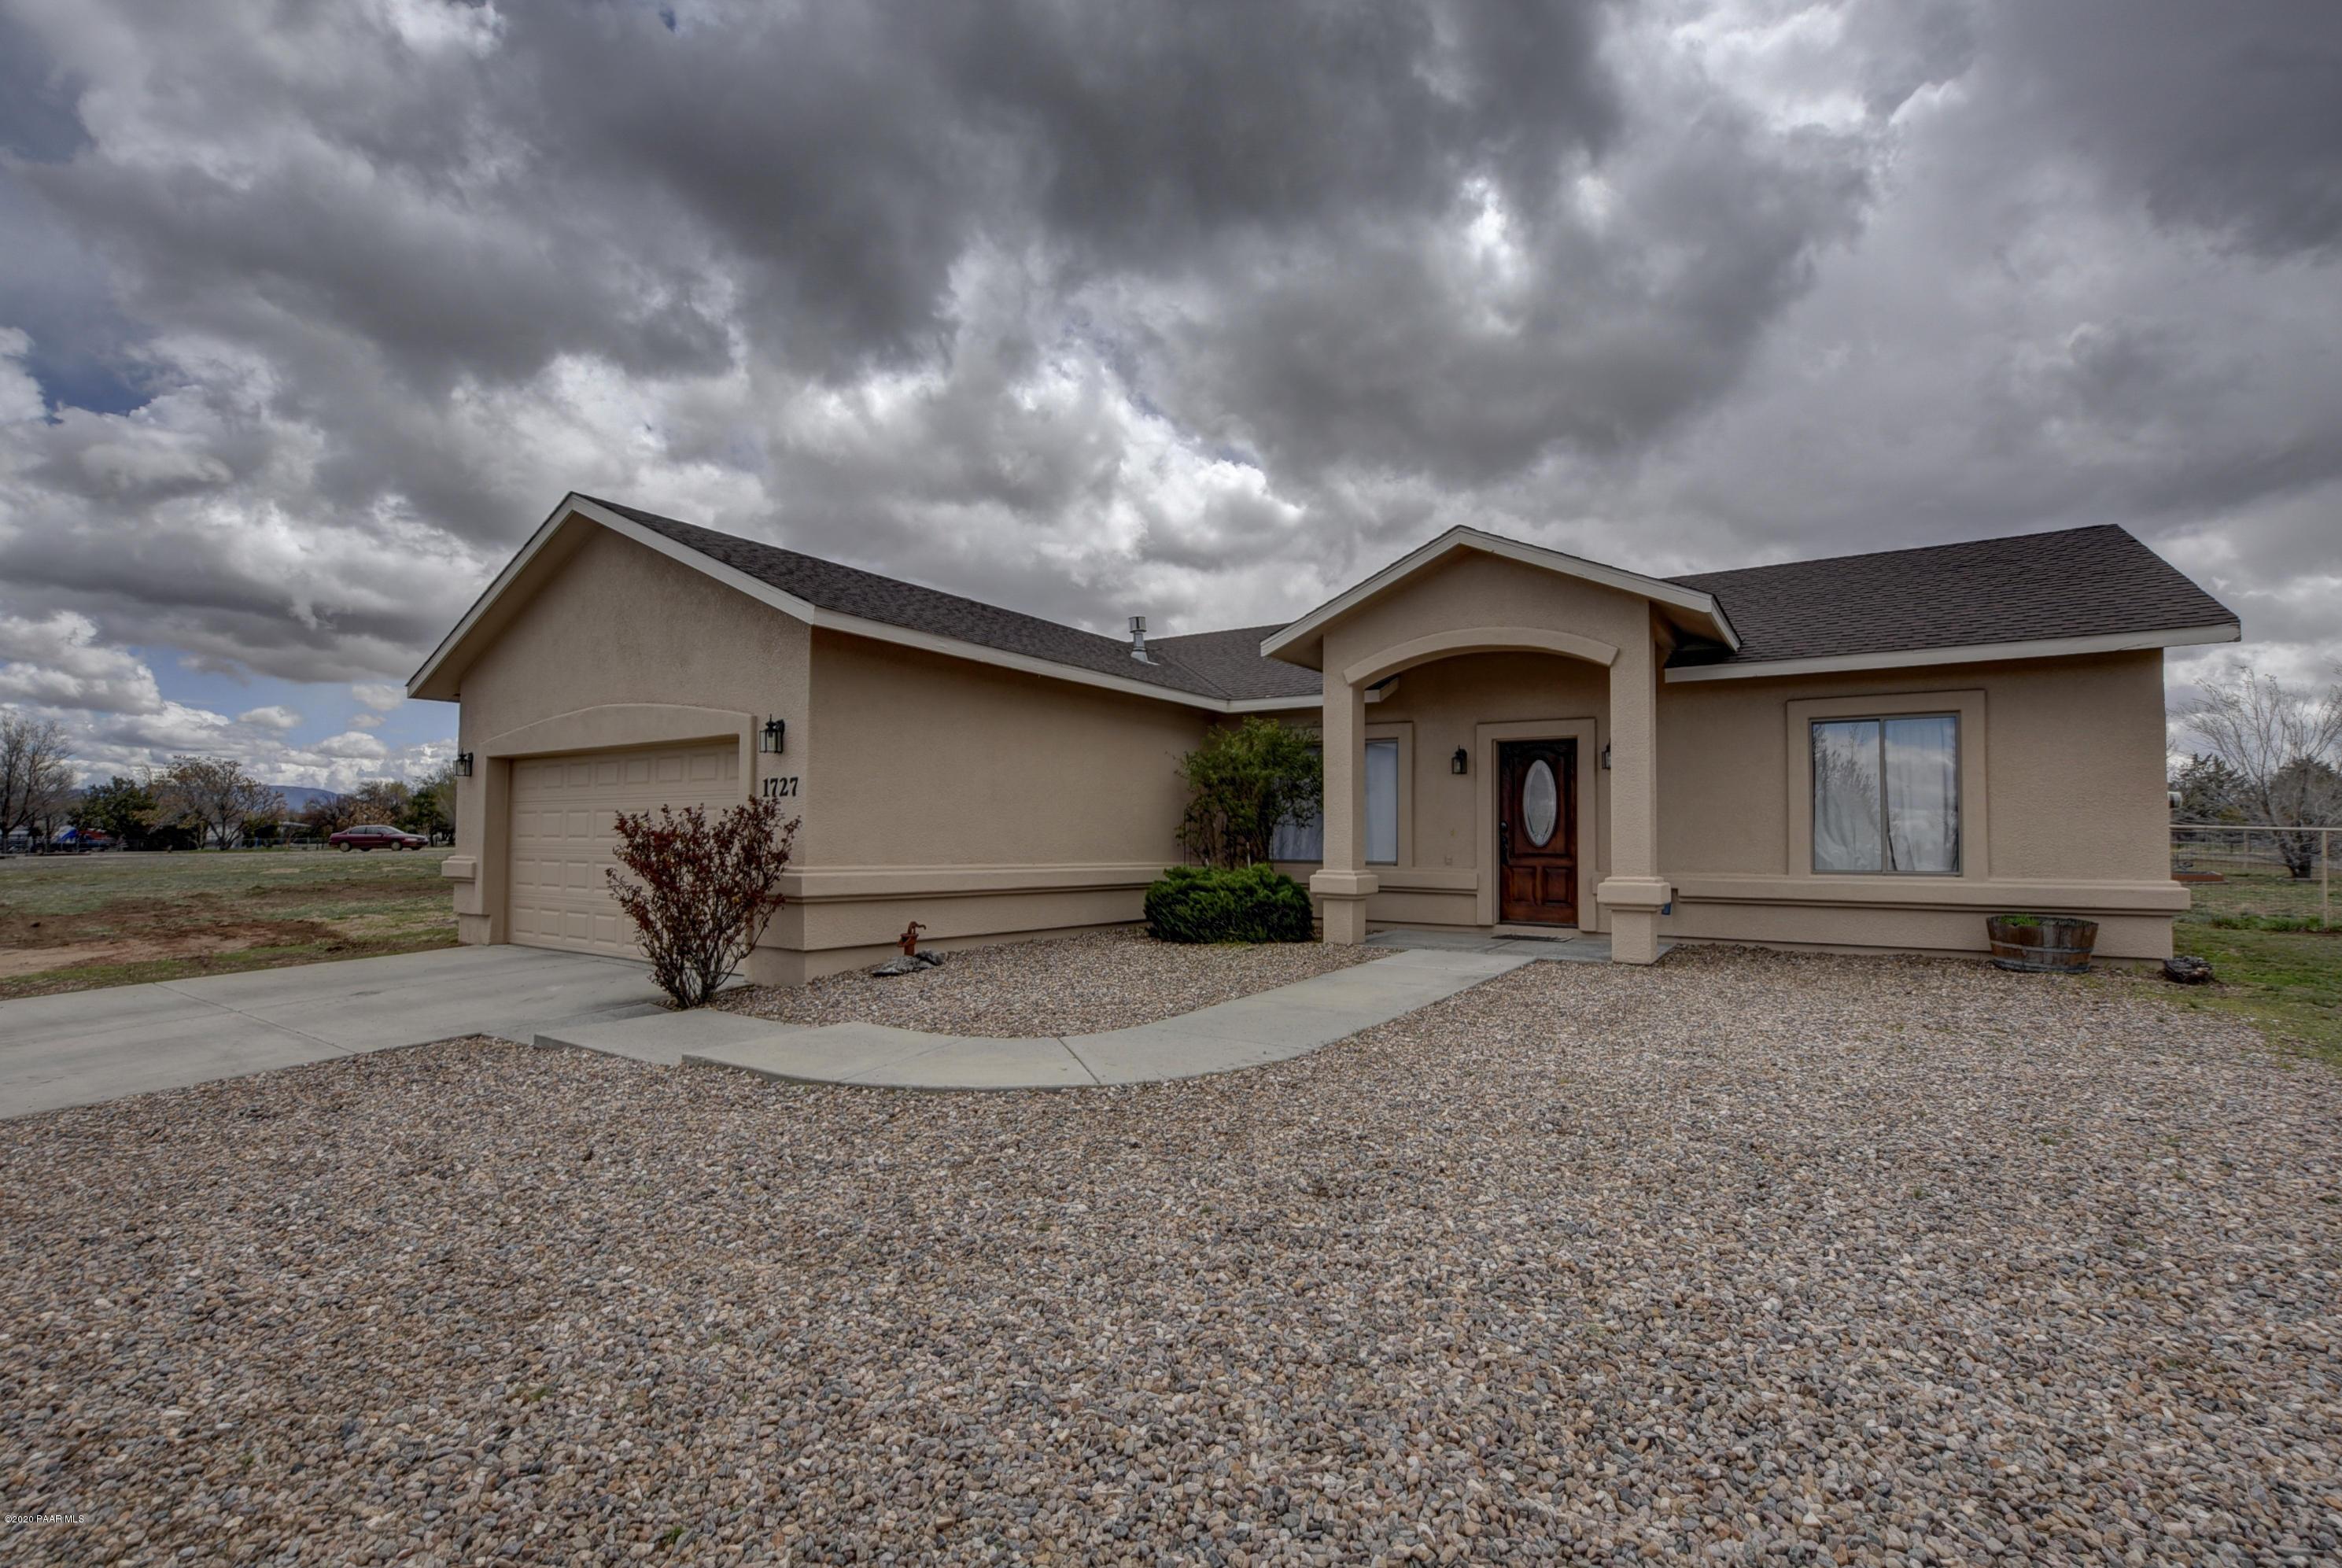 Photo of 1727 Bernice, Chino Valley, AZ 86323